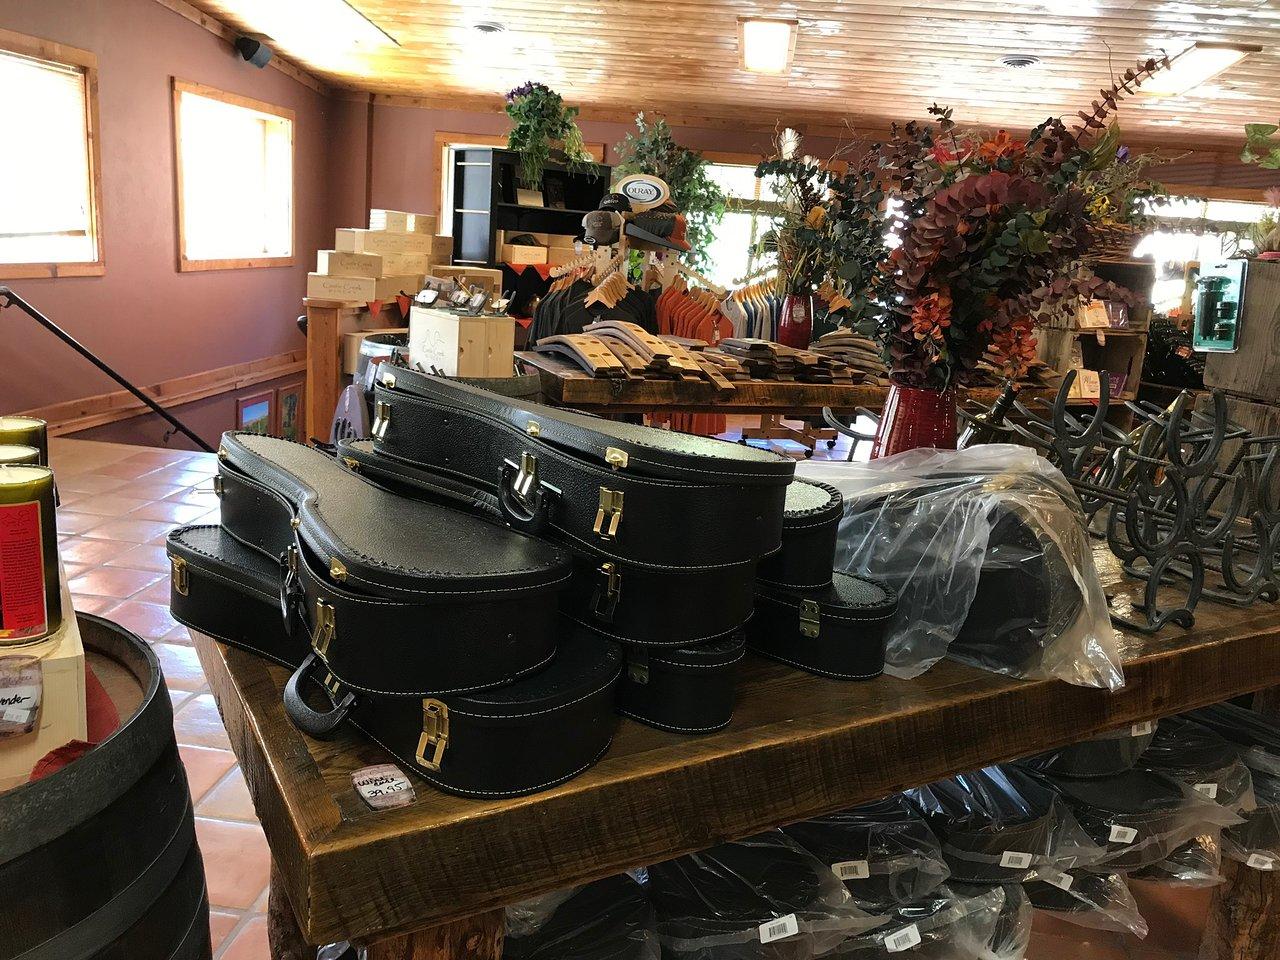 THE COWBOY GRILL RESTAURANT, Moab Omdömen om restauranger